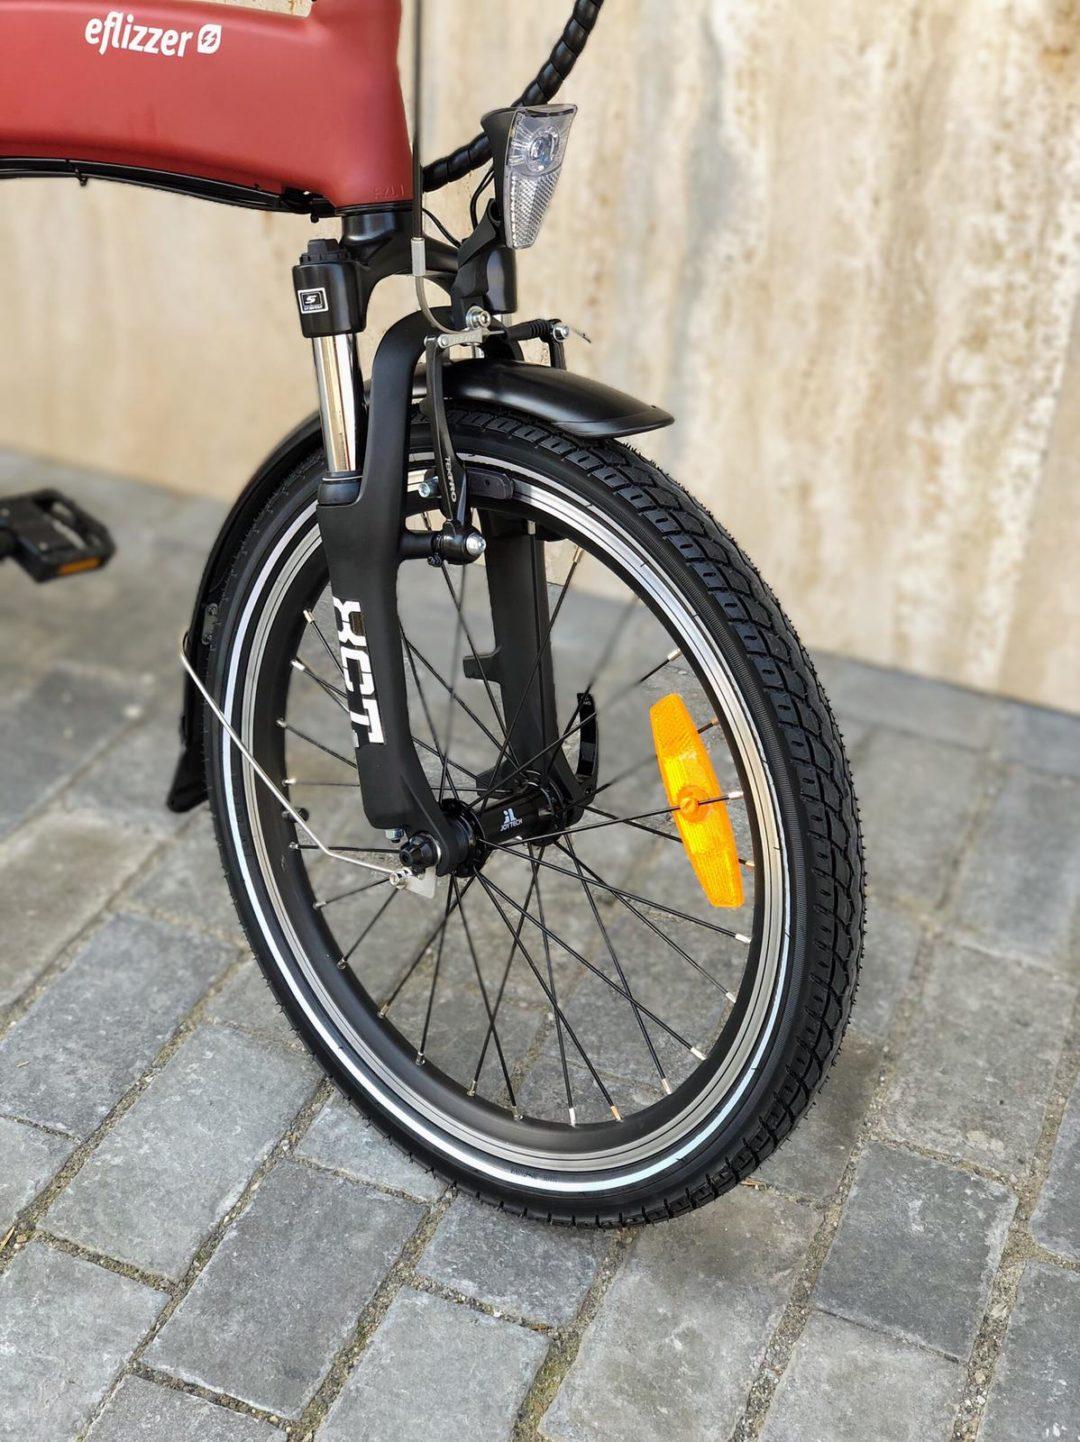 eflizzer klappbares E-Bike Sprint - Suntour XCT Federgabel